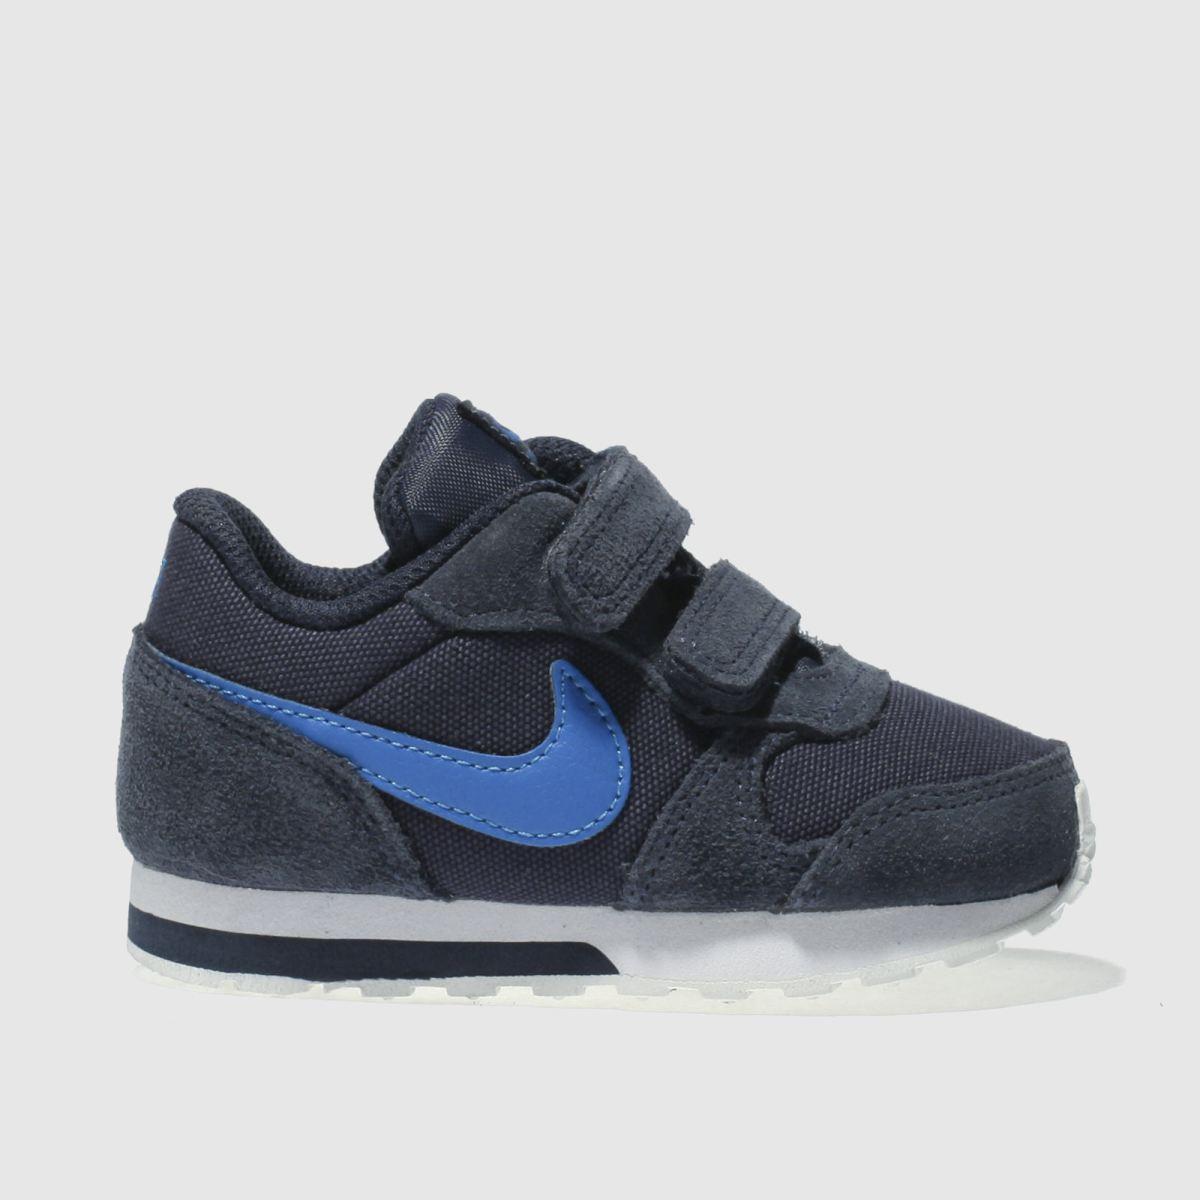 Nike Navy Md Runner 2 Boys Toddler Trainers